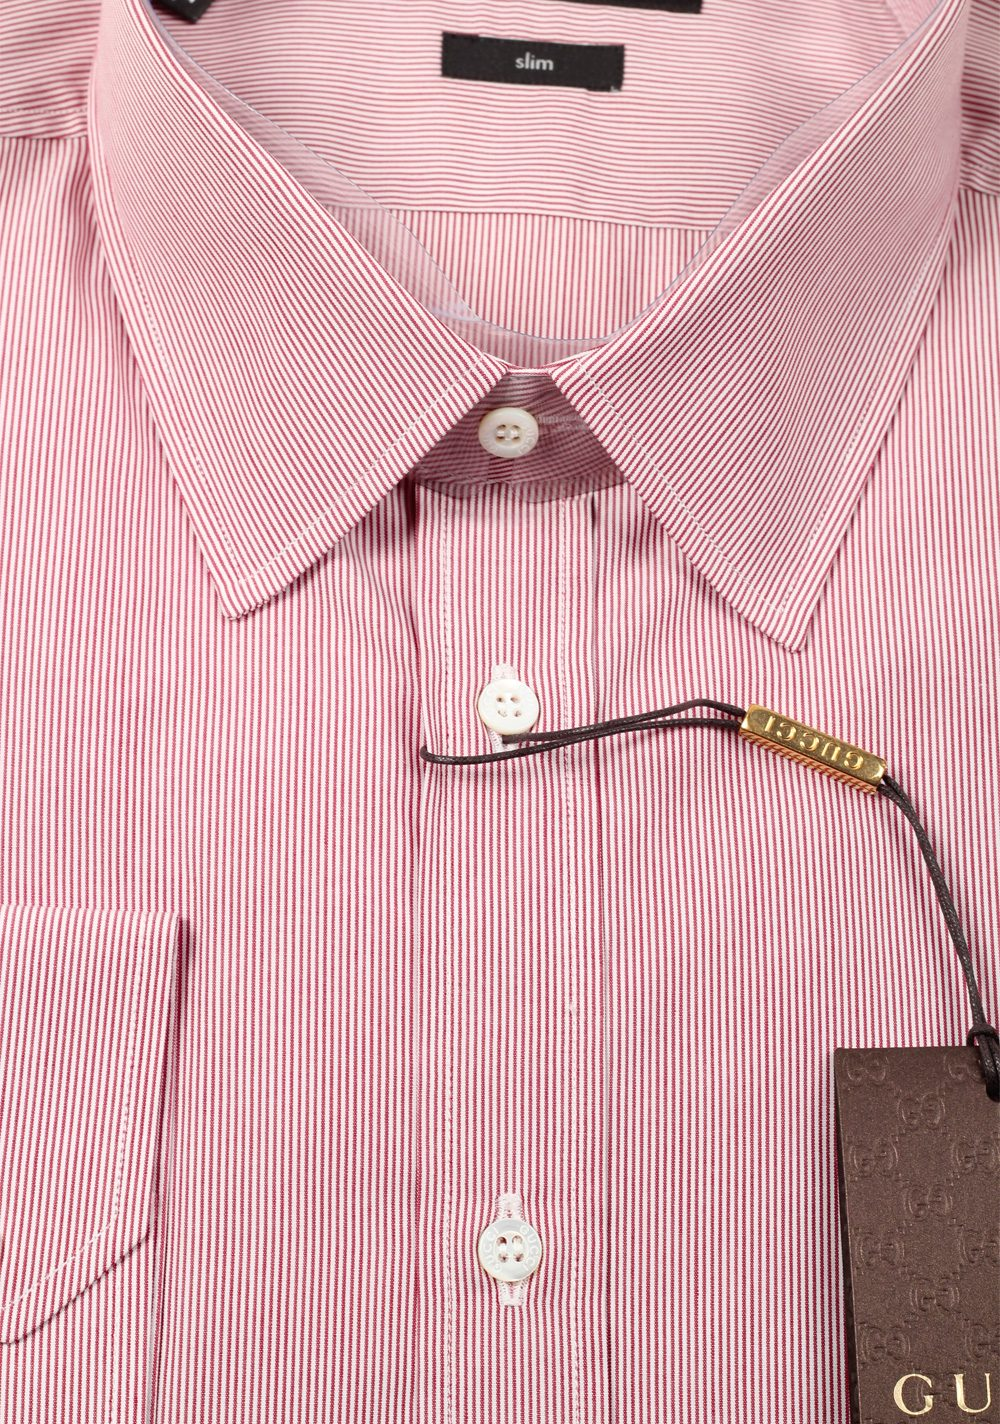 Gucci Striped Red White Dress Shirt Size 40 / 15,75 U.S. Slim | Costume Limité